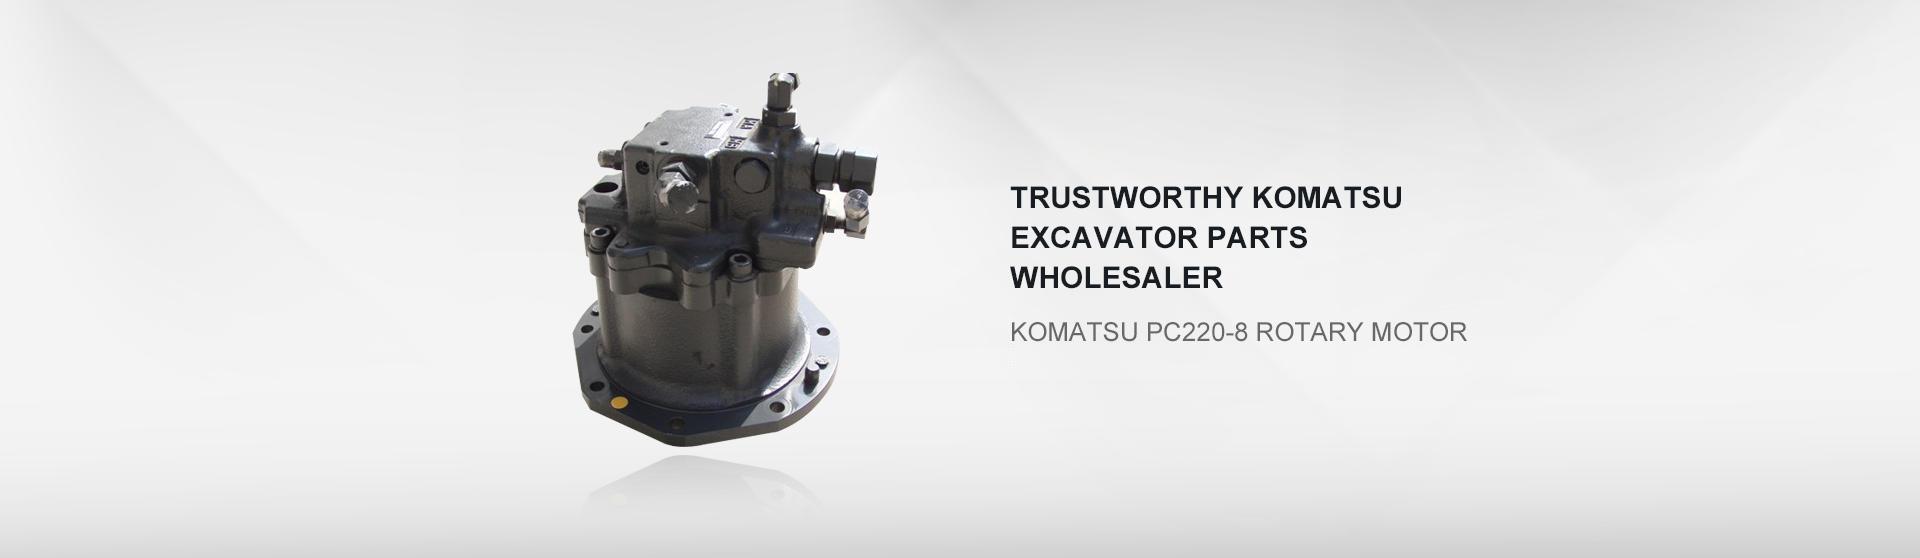 Komatsu PC200-8 rotary motor